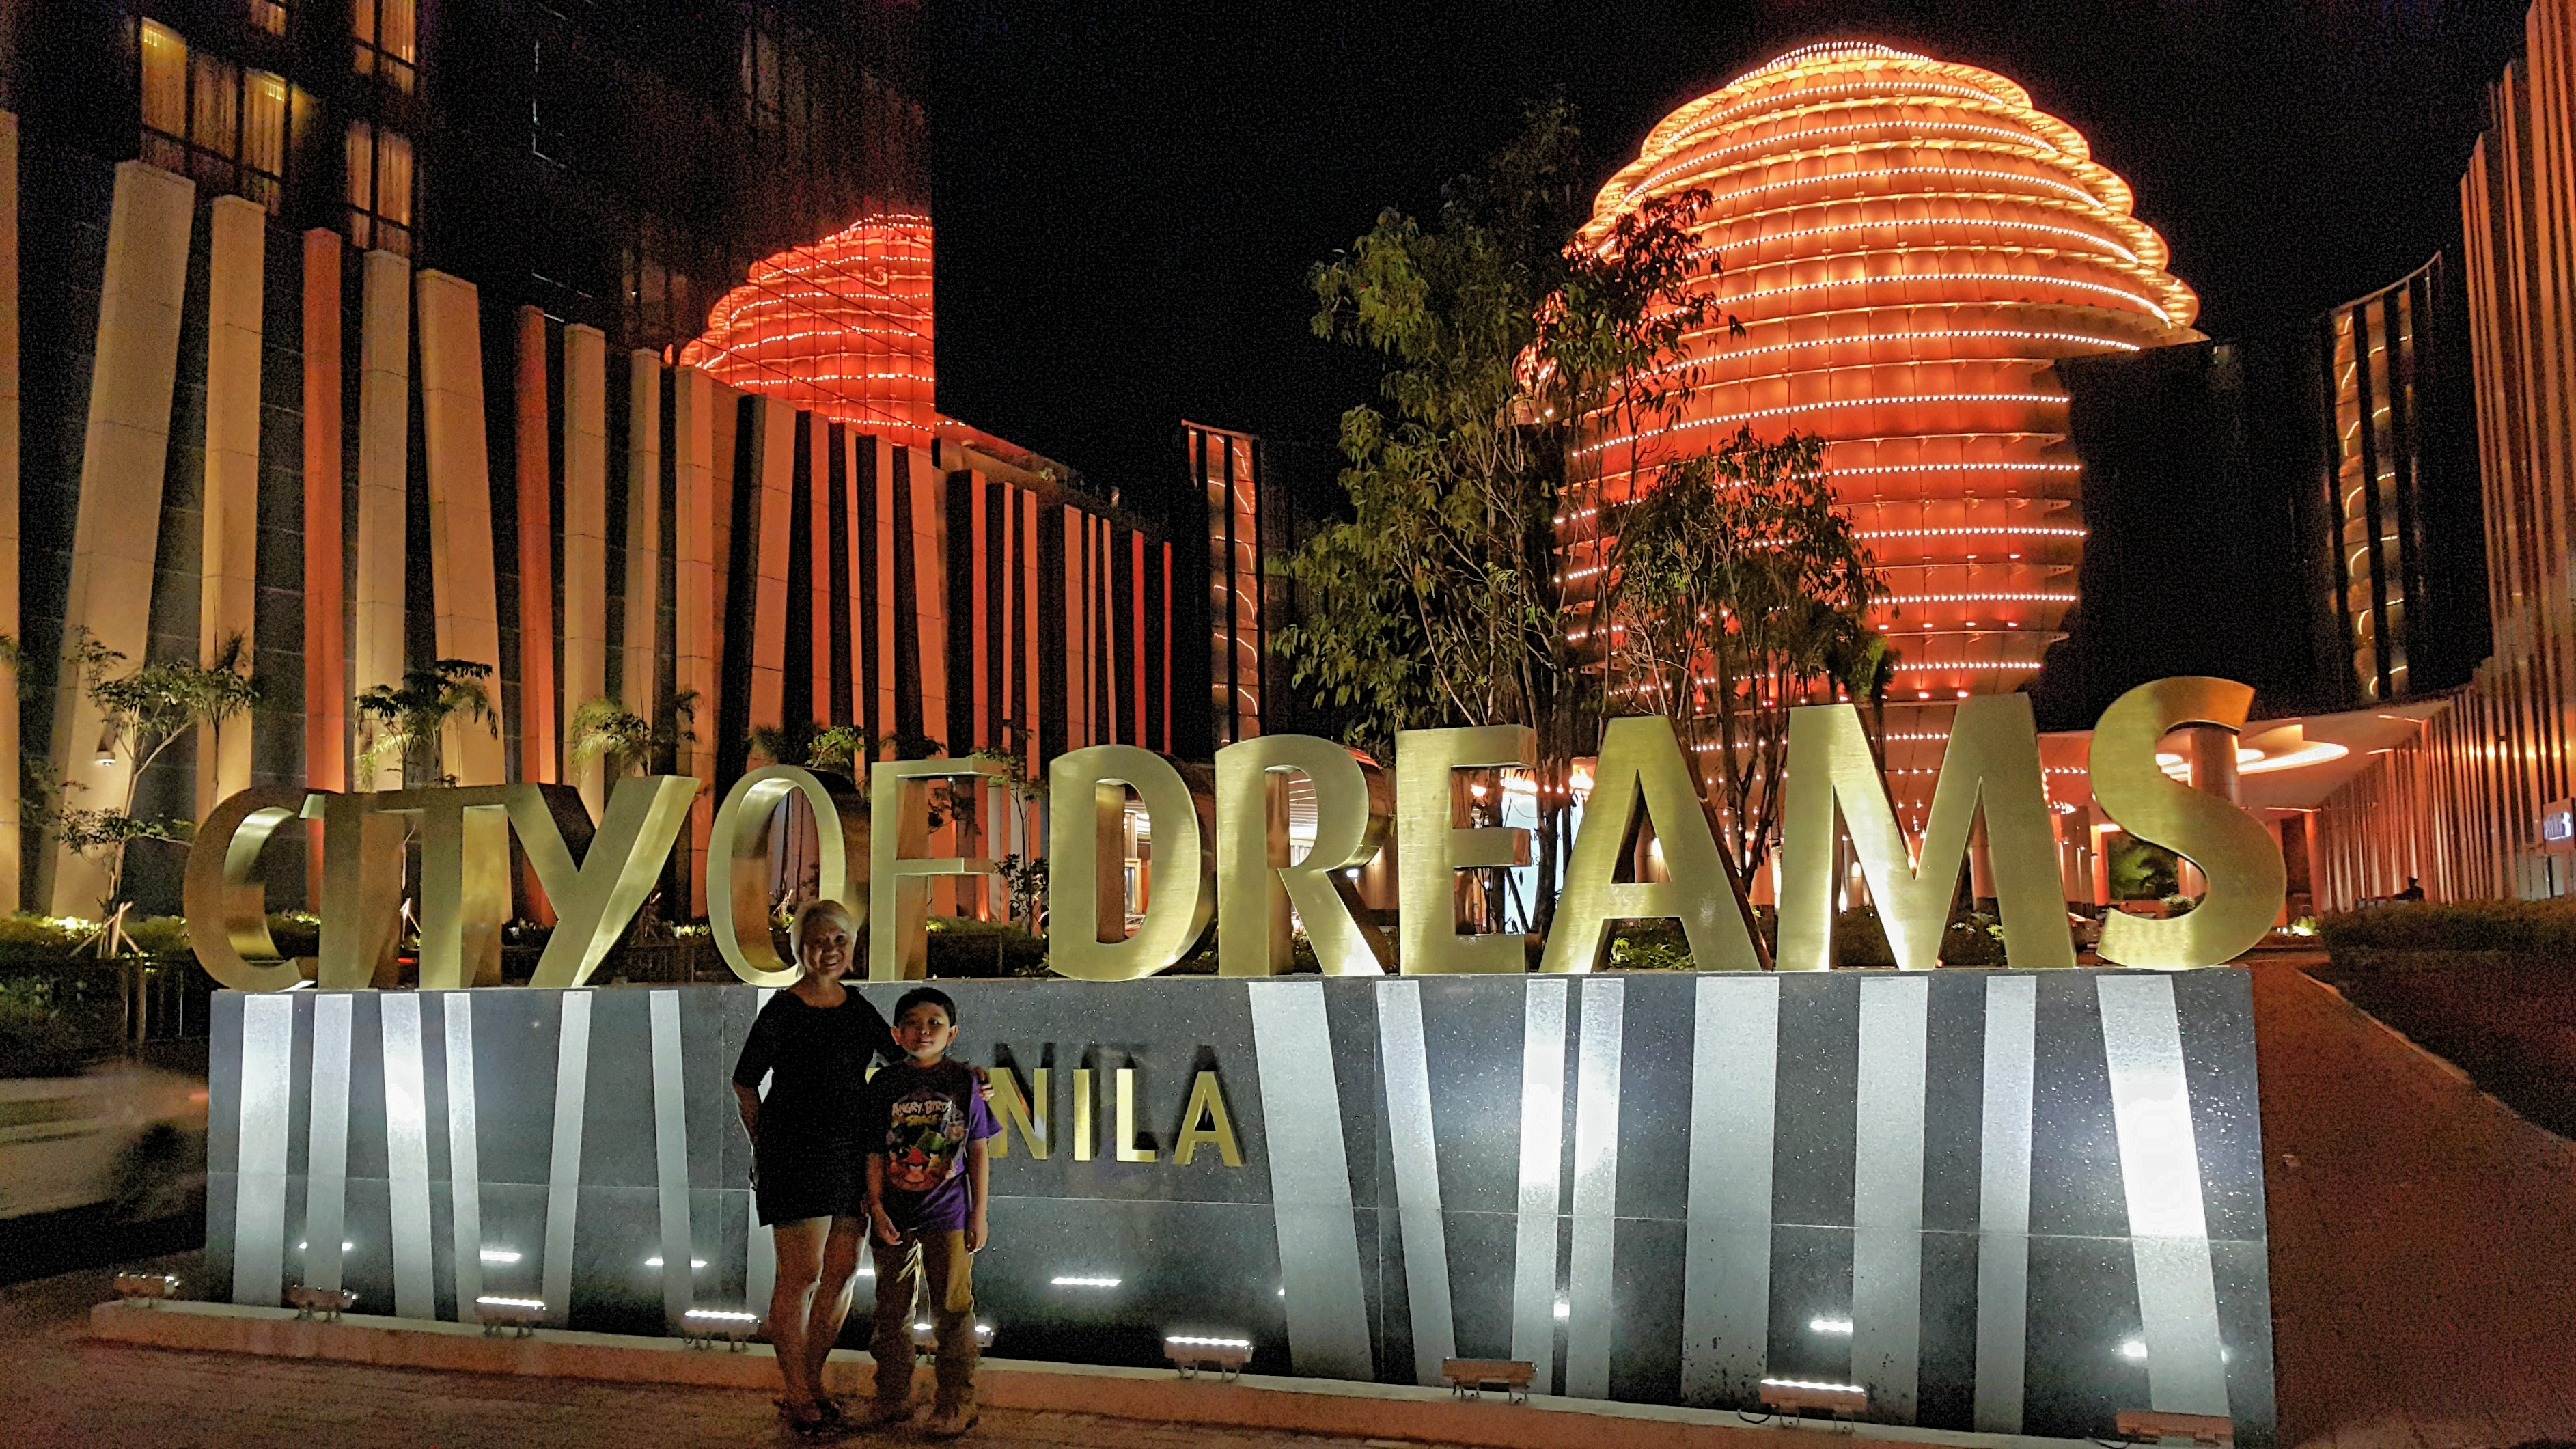 Manila casino dress code jouer au casino gratuitement roulette